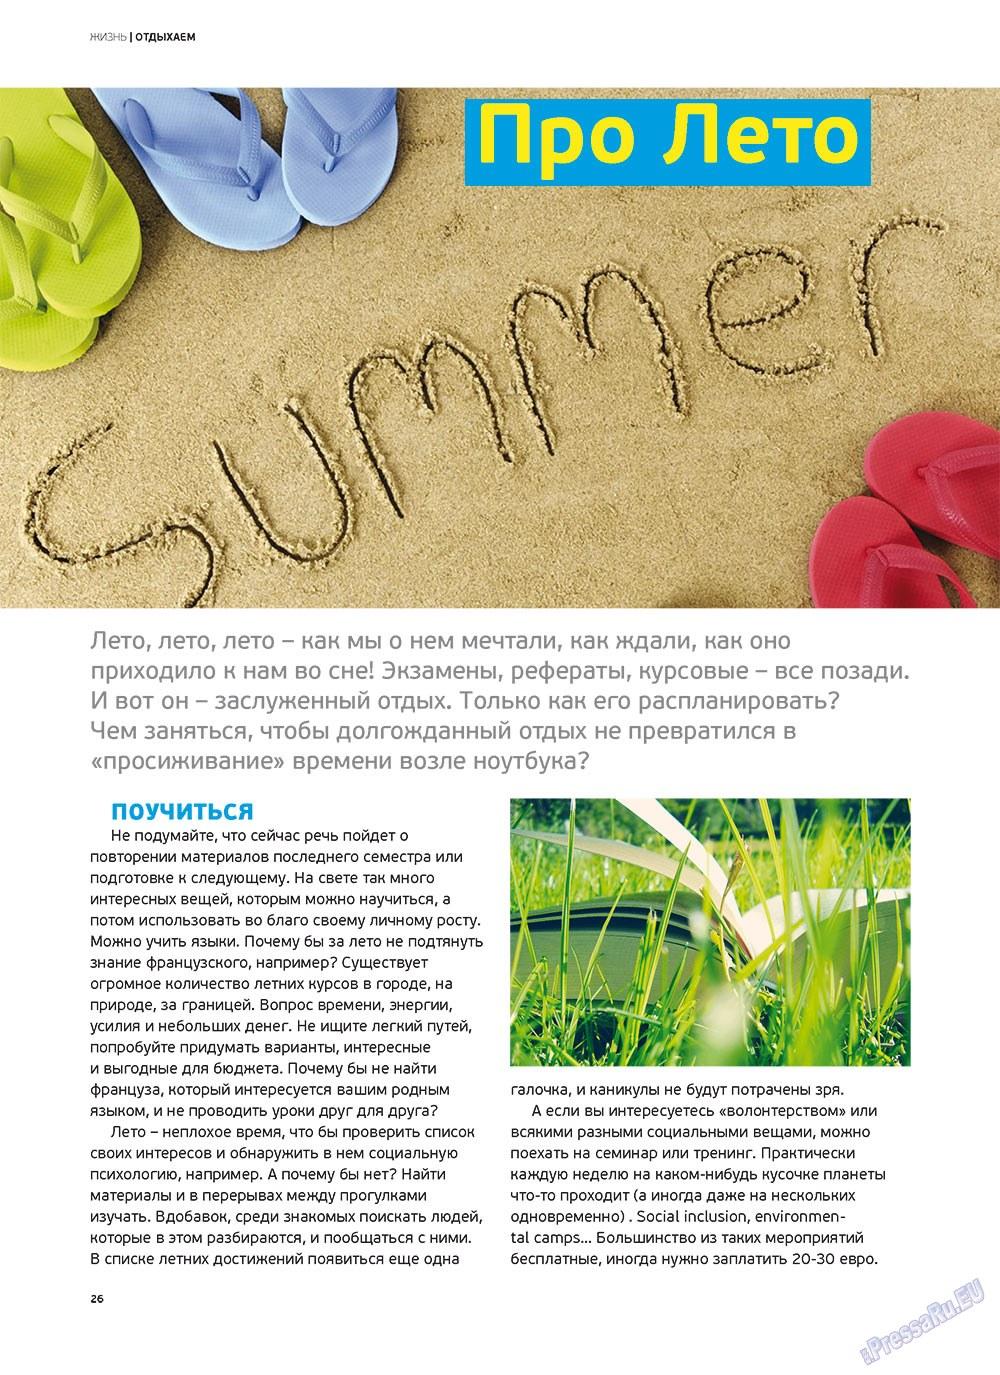 Артек (журнал). 2012 год, номер 2, стр. 28